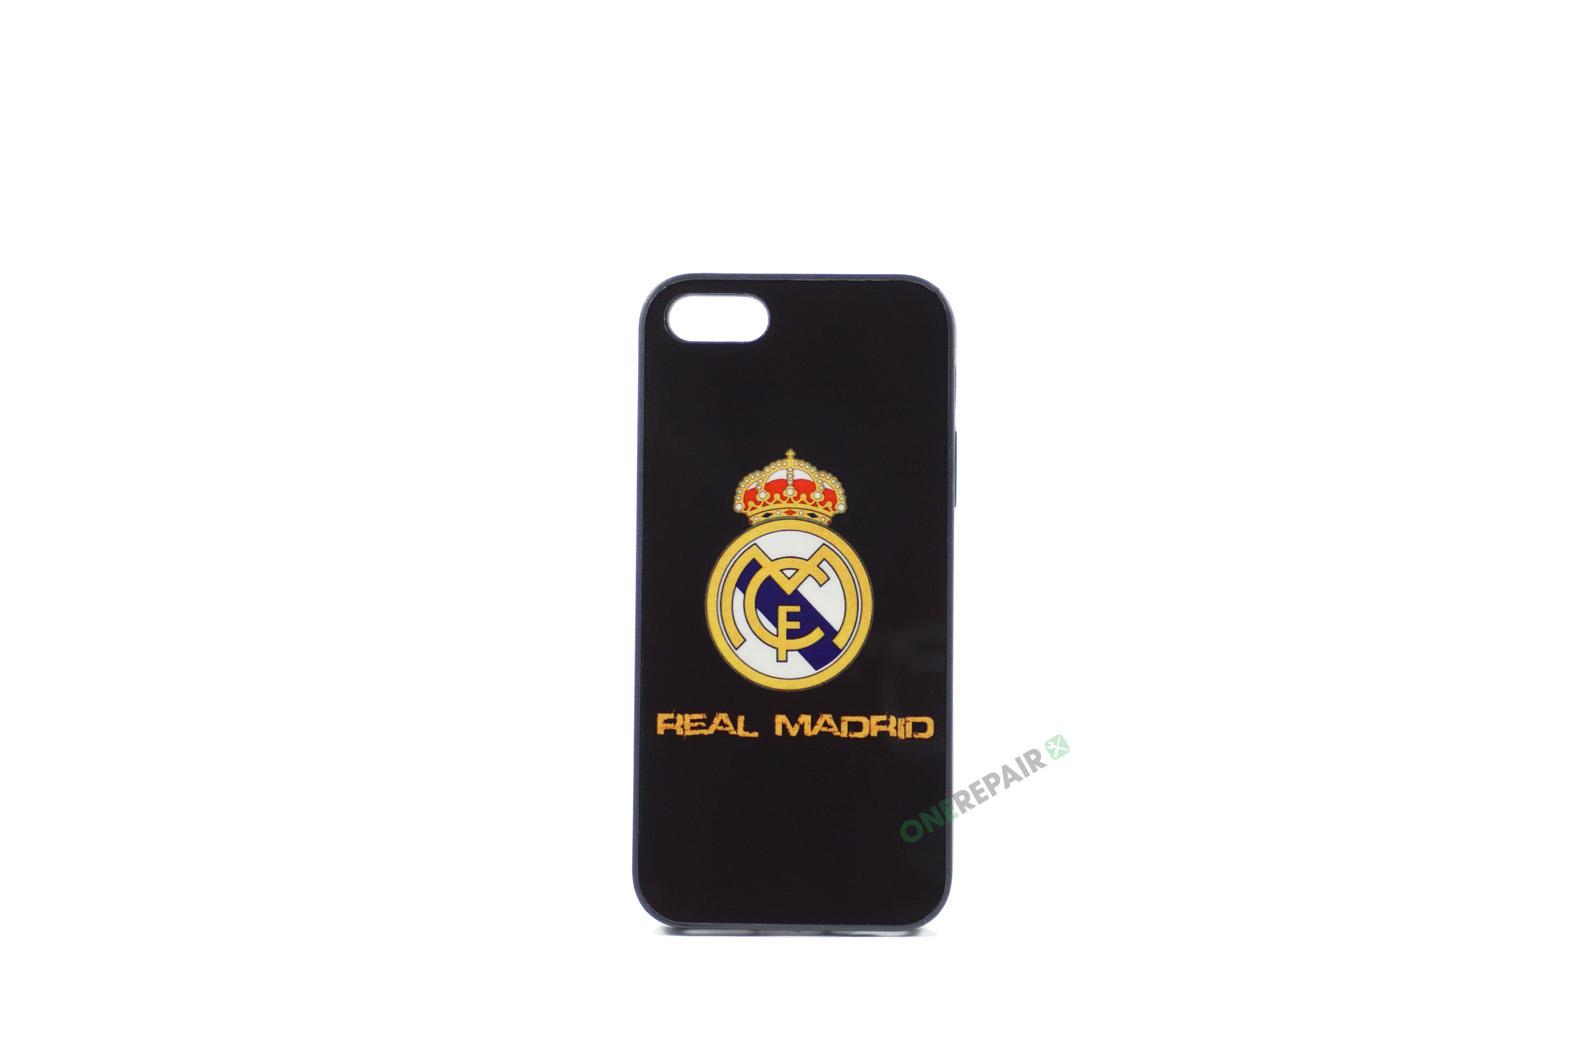 Billig iPhone 5 5S SE Cover Bagcover Fodbold Klub Real Madrid RMFC Gummicover A1453 A1457 A1518 A1528 A1530 A1533 A1428 A1429 A1442 A1723 A1662 A1724